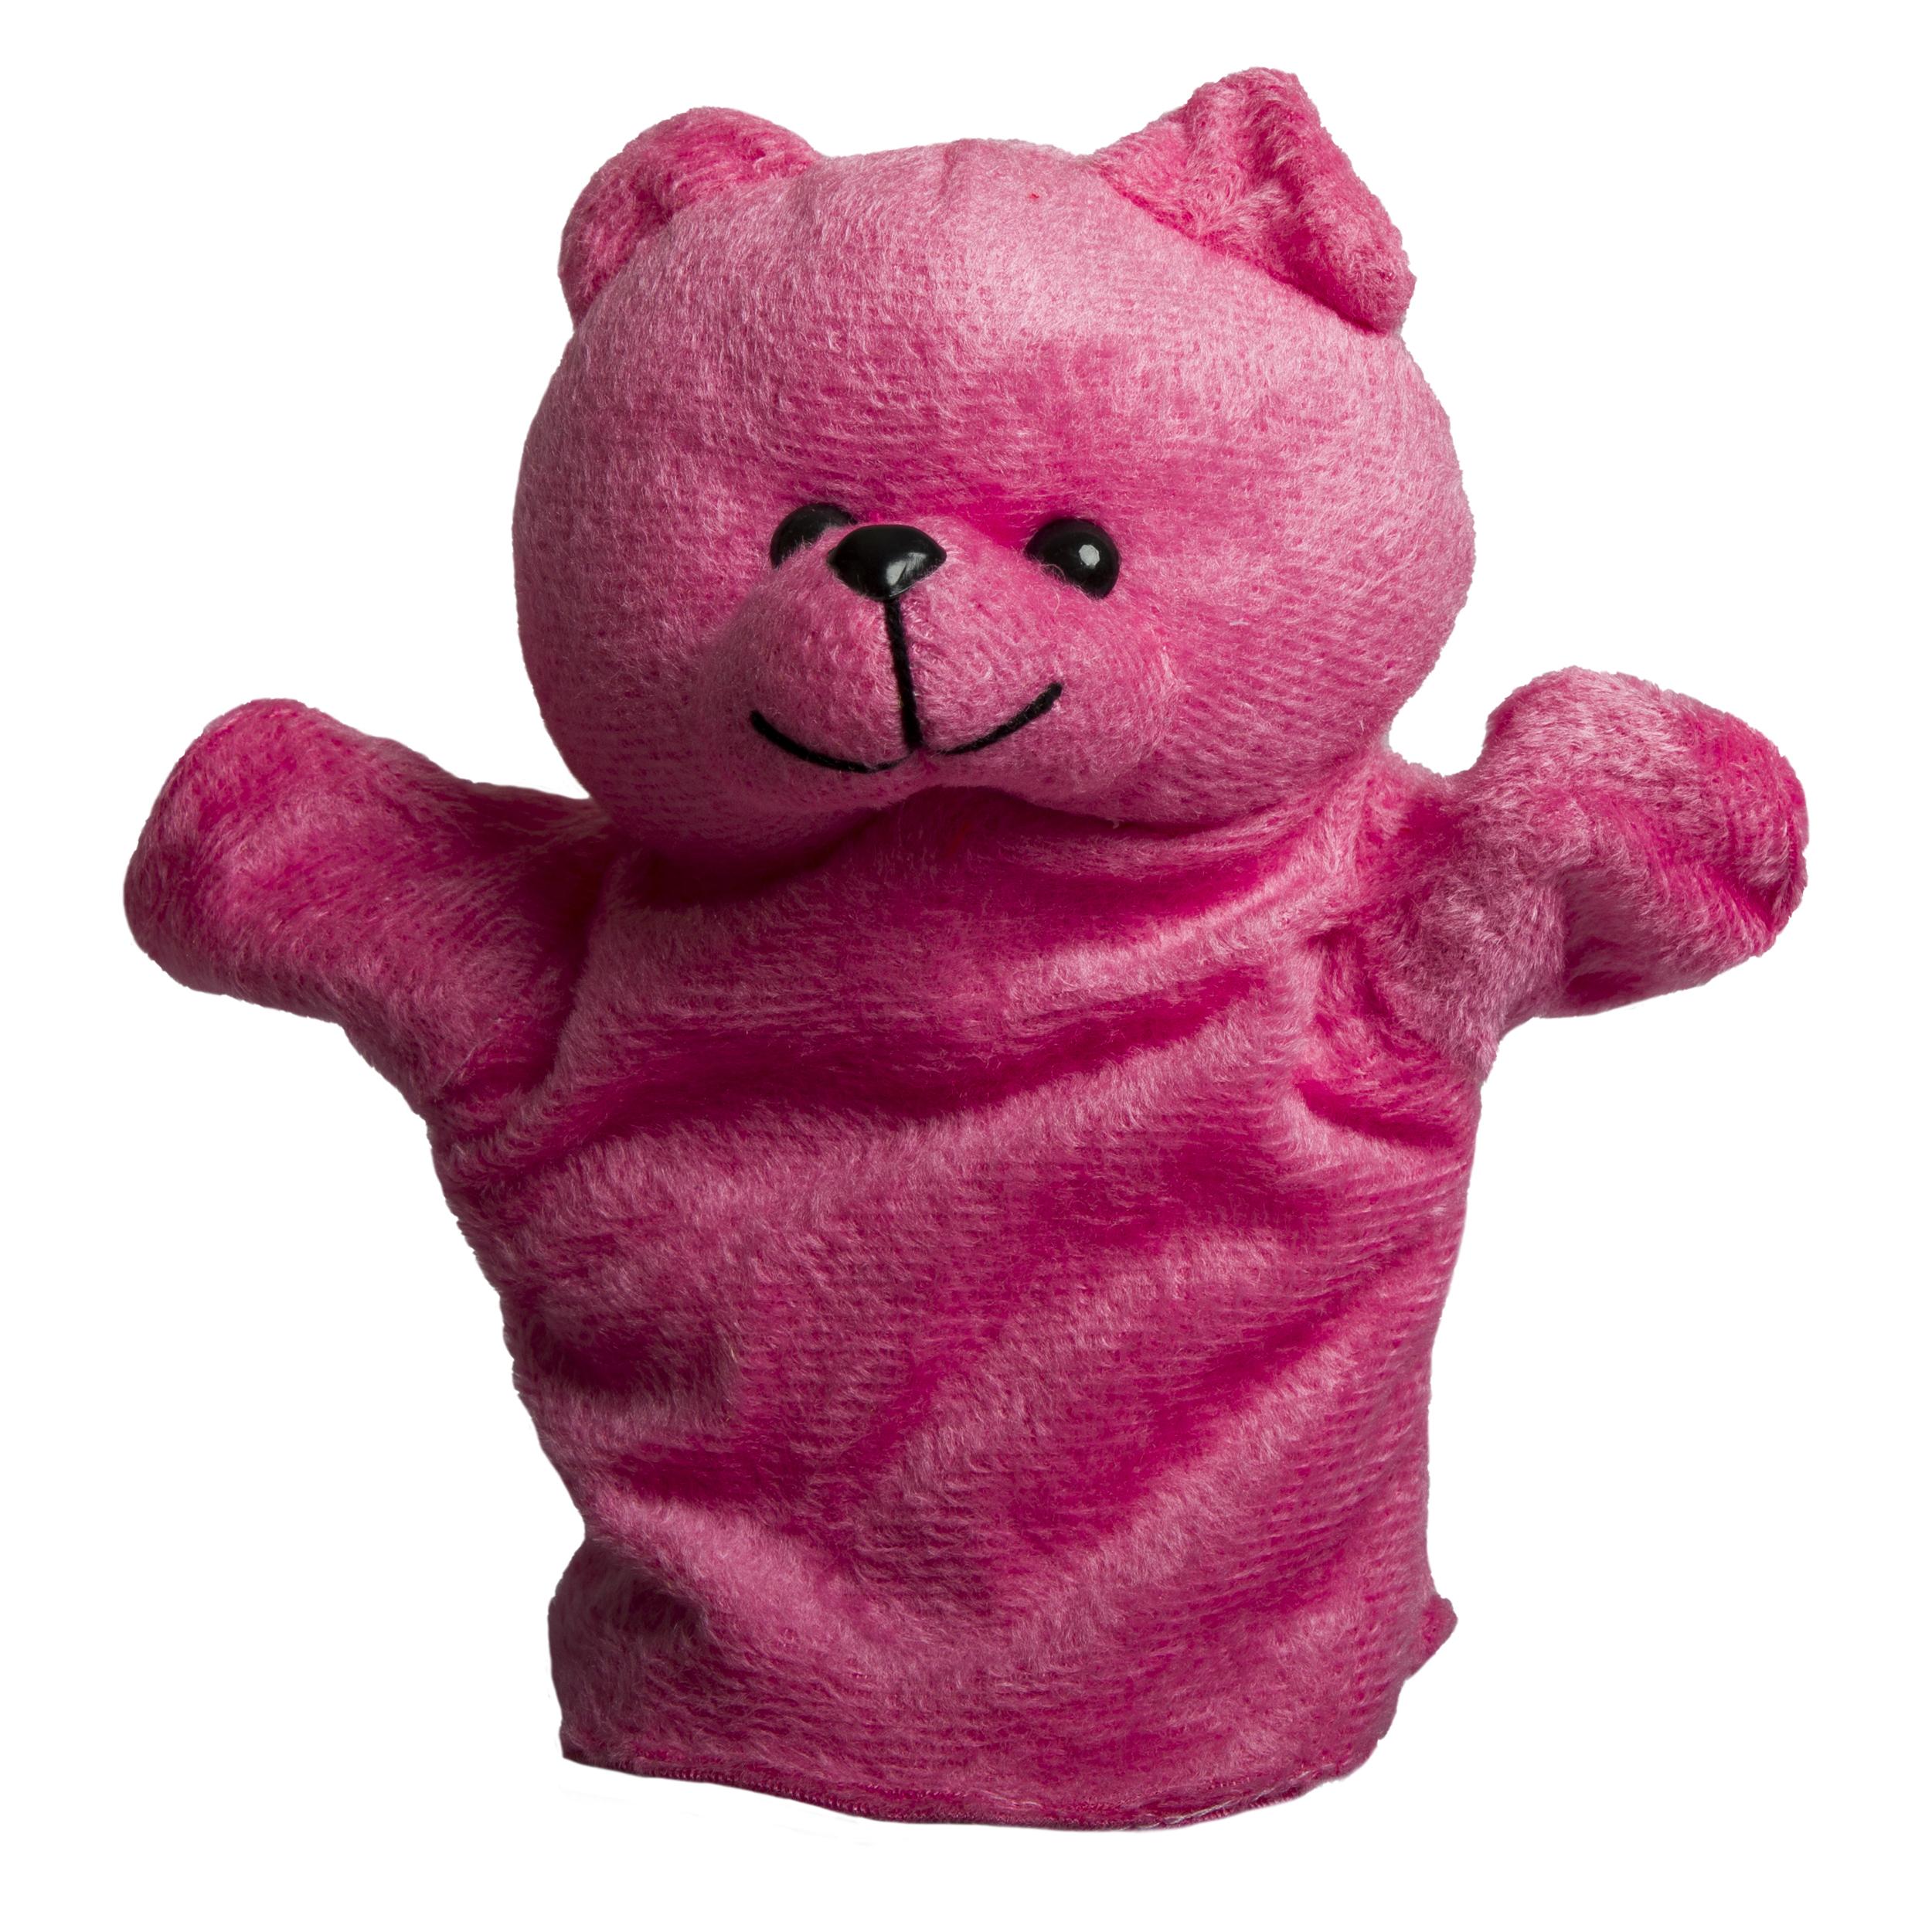 عروسک نمایشی طرح خرس مدل 1321